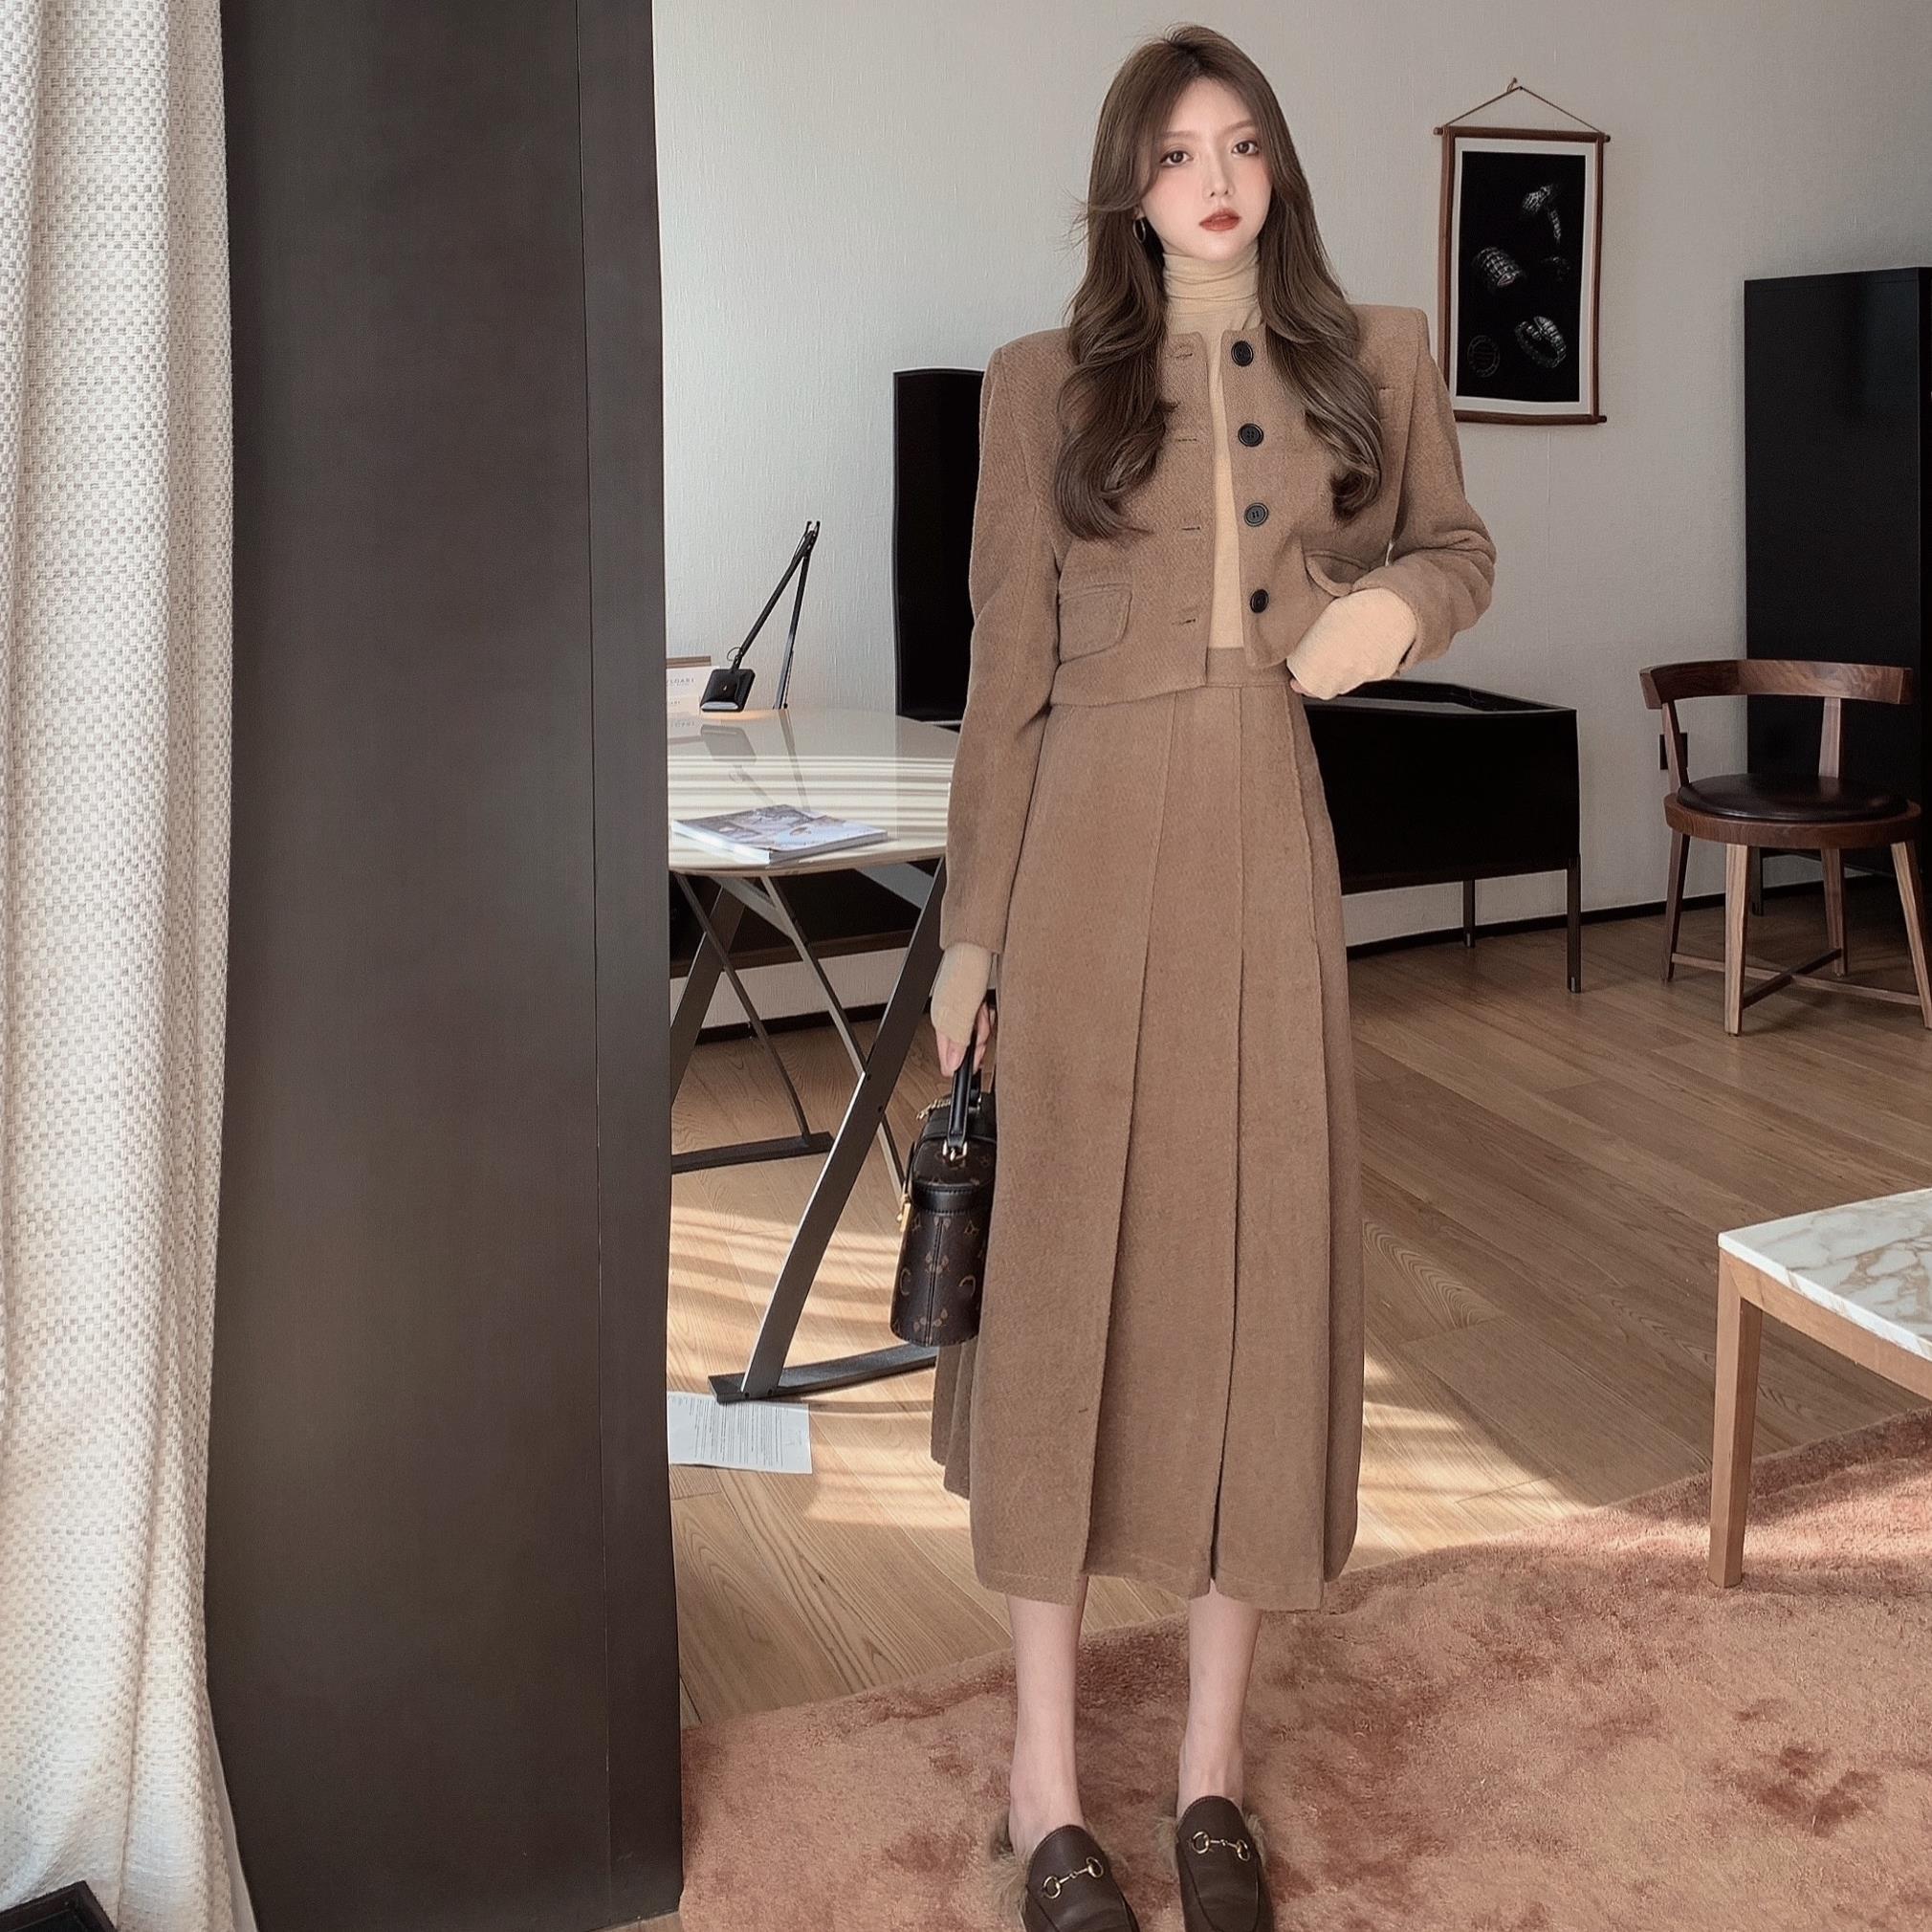 Autumn And Winter Elegant Women's Skirt Suit Vintage Jacket Woolen Short Coatpleated Skirt Two-Piece Set Female